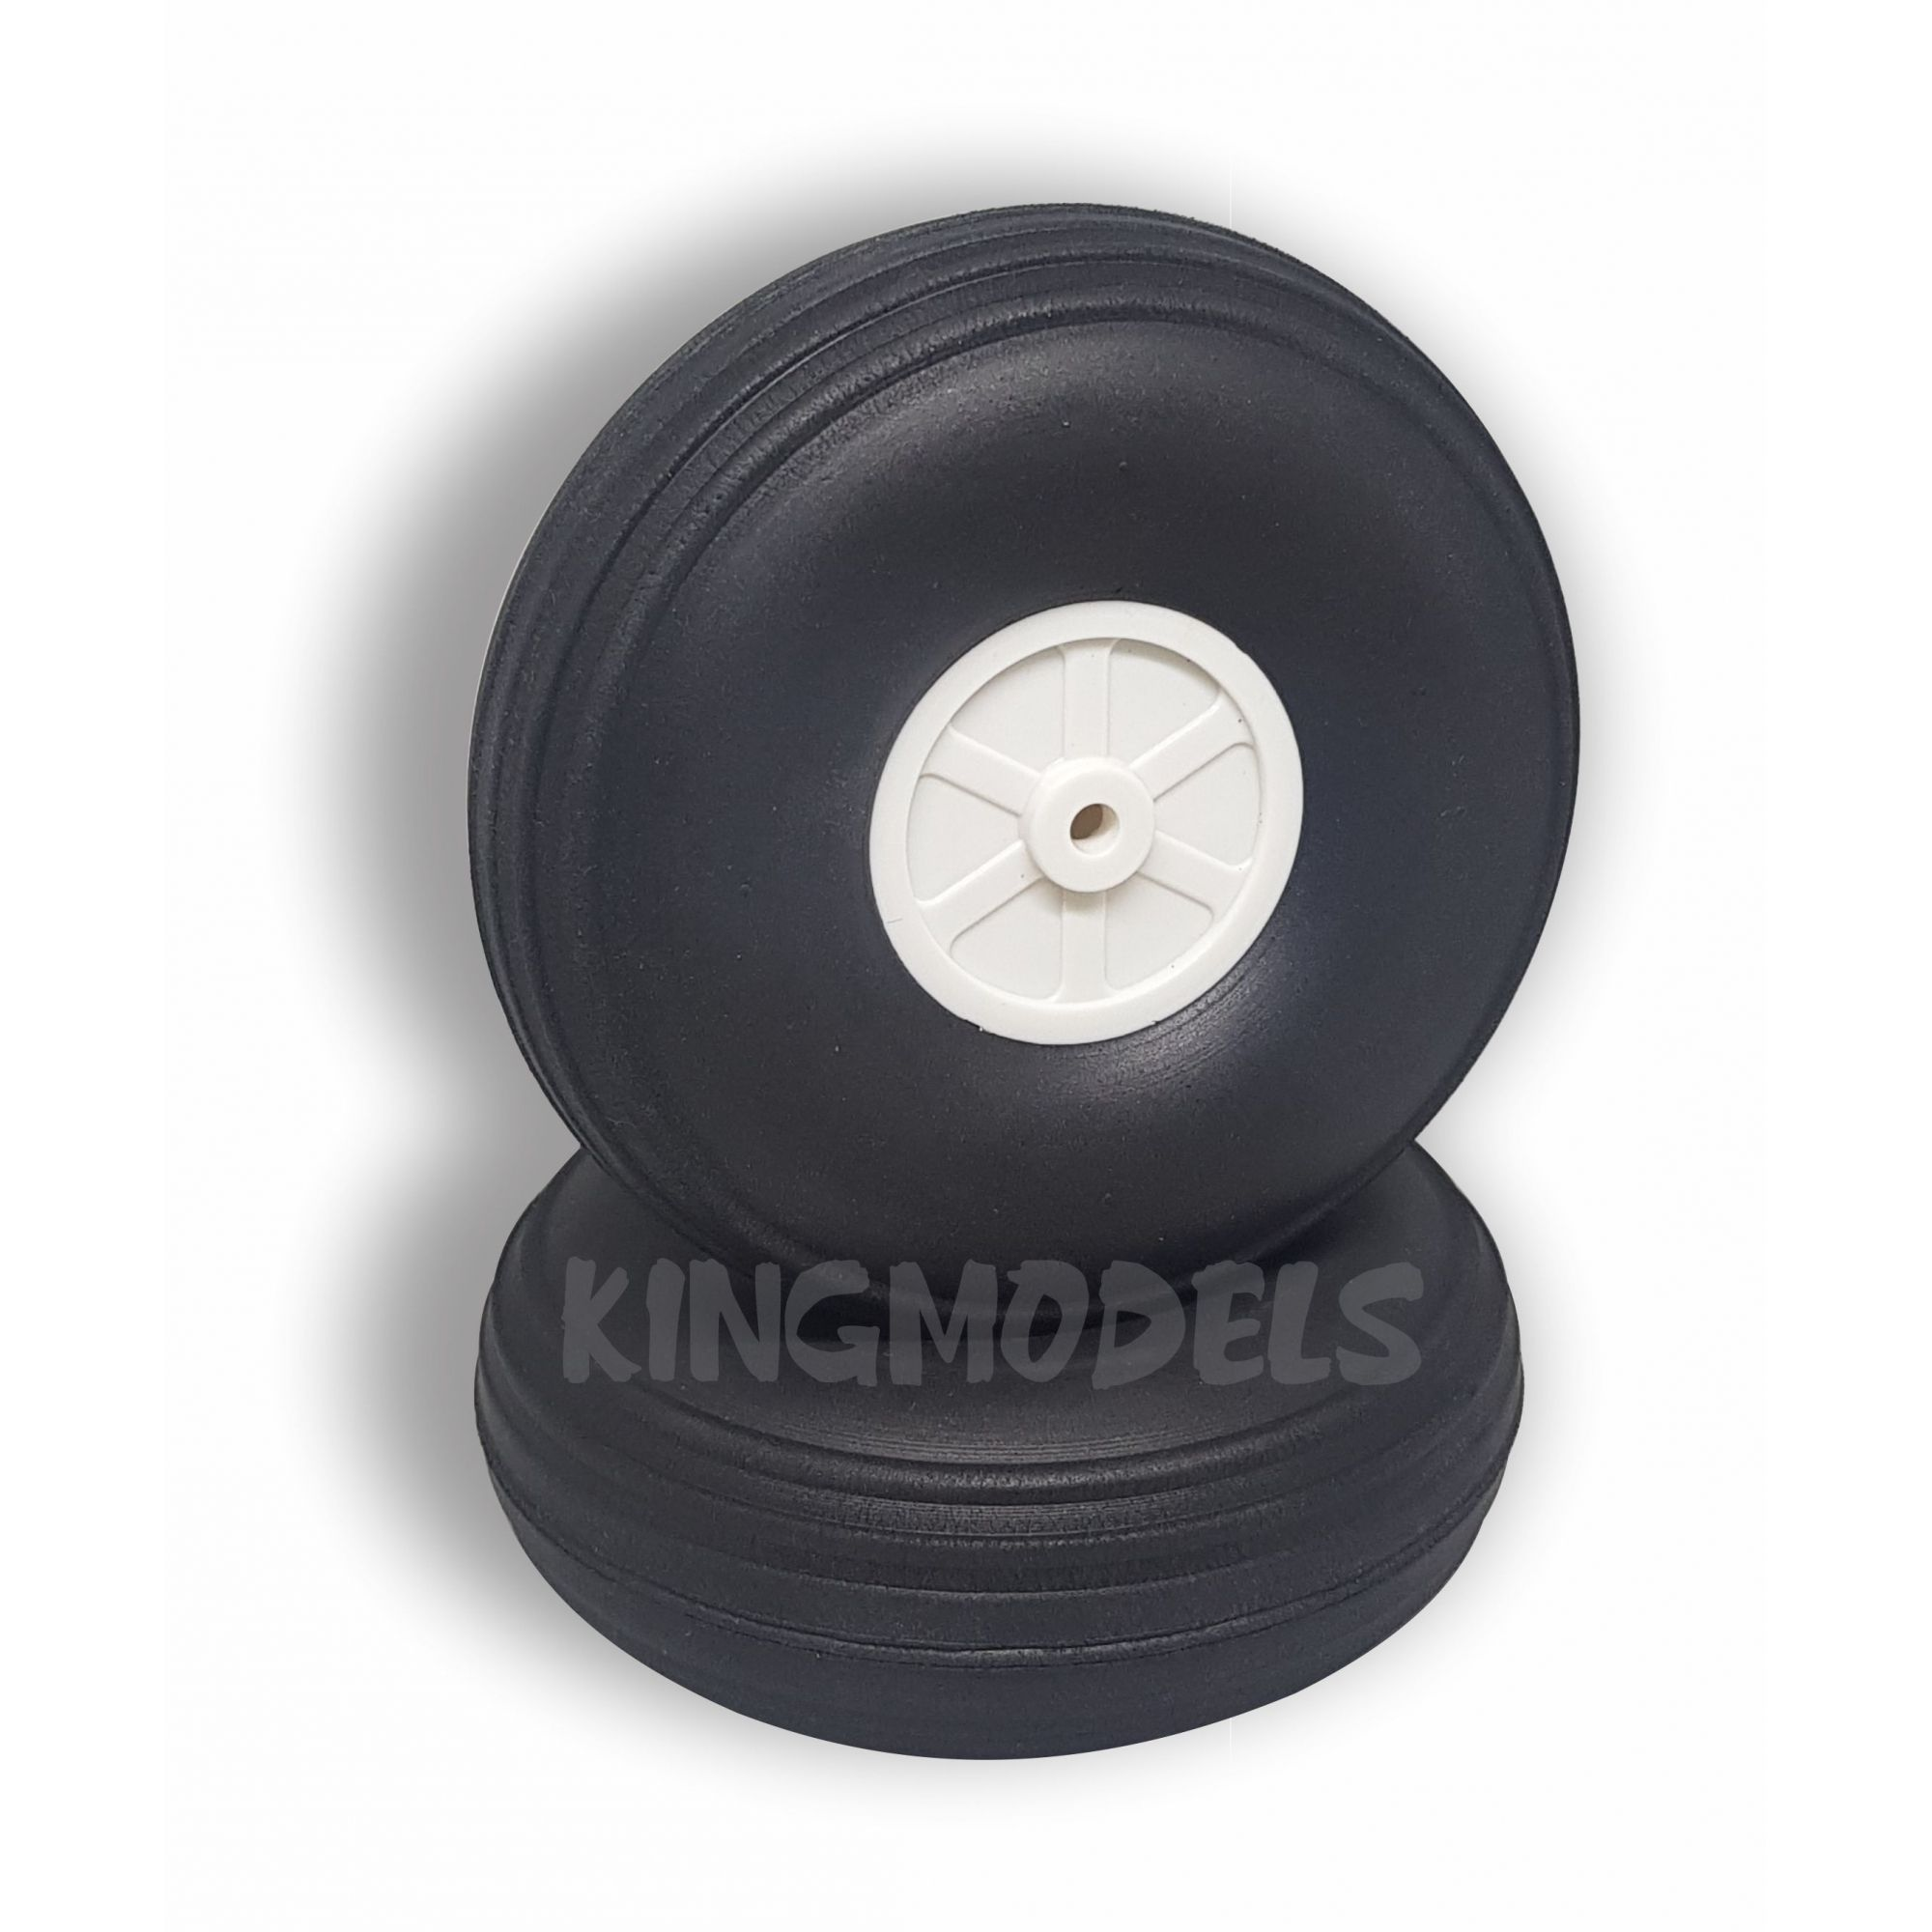 Roda De Borracha Extra-leve E Cubo Nylon-44mm-Aerodinâmica (2pçs)  - King Models